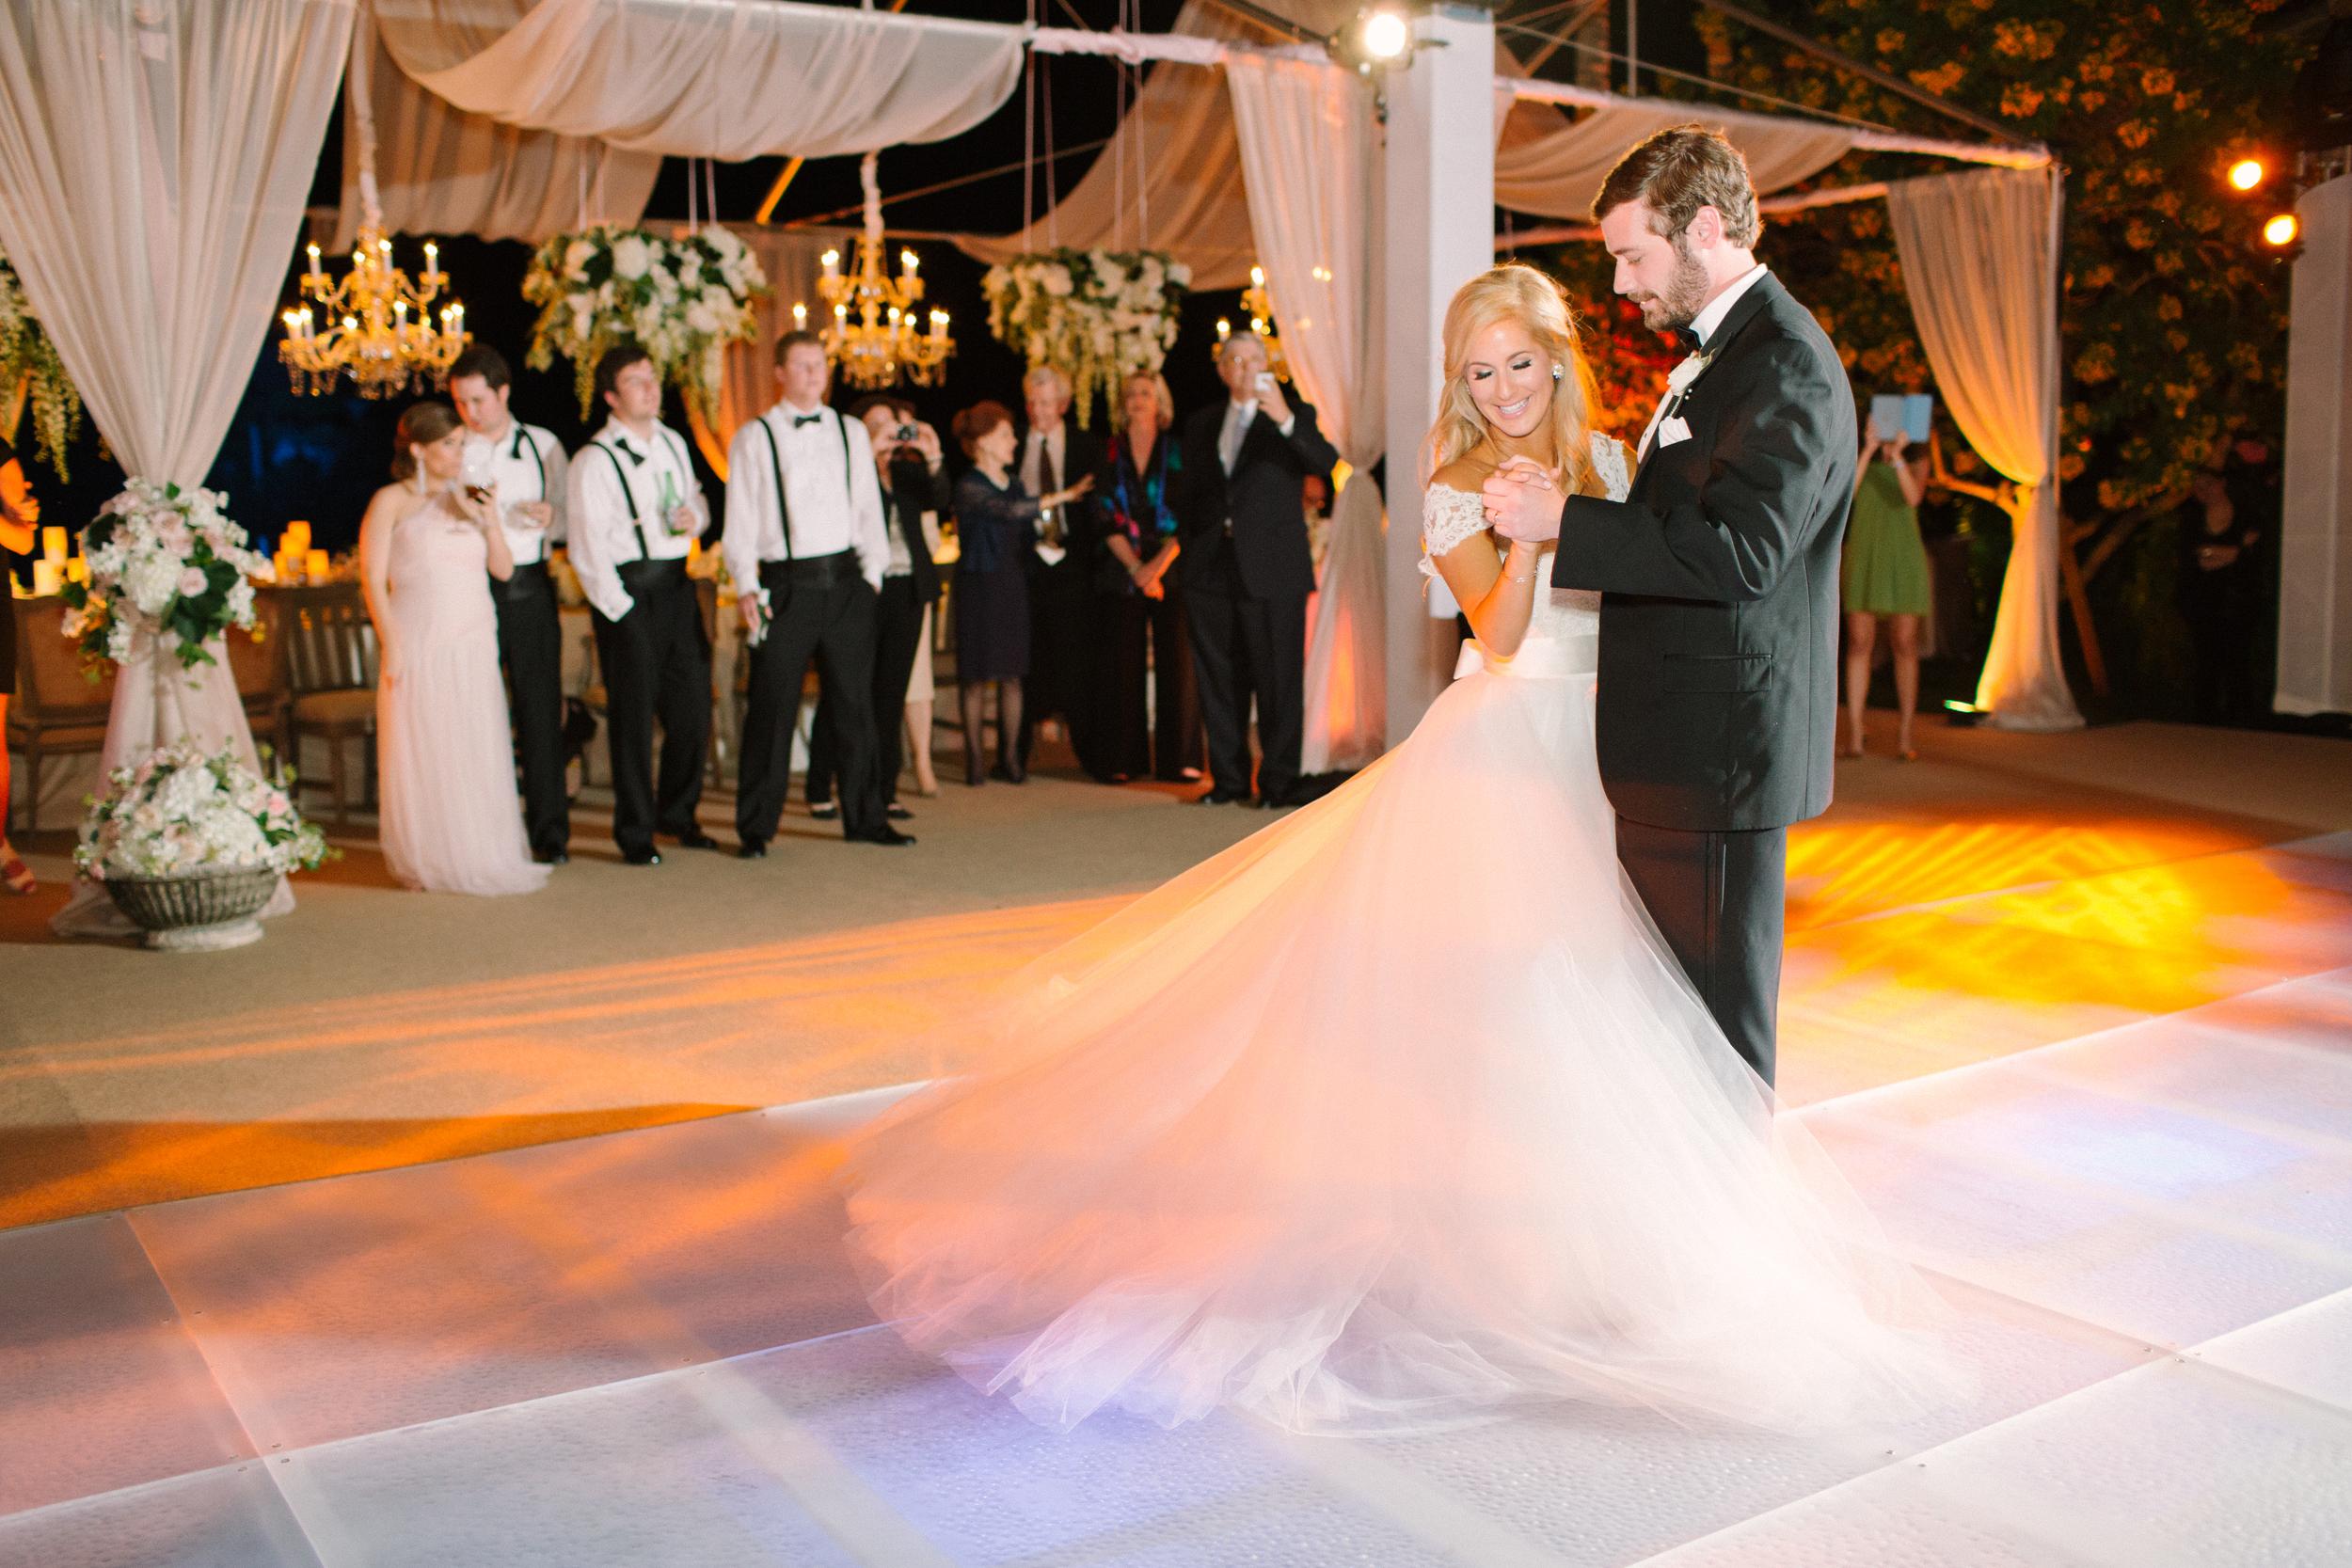 Ceci_New_York_Florida_Wedding_Style_Bride_Watercolor_Real_Custom_Luxury_17.jpg